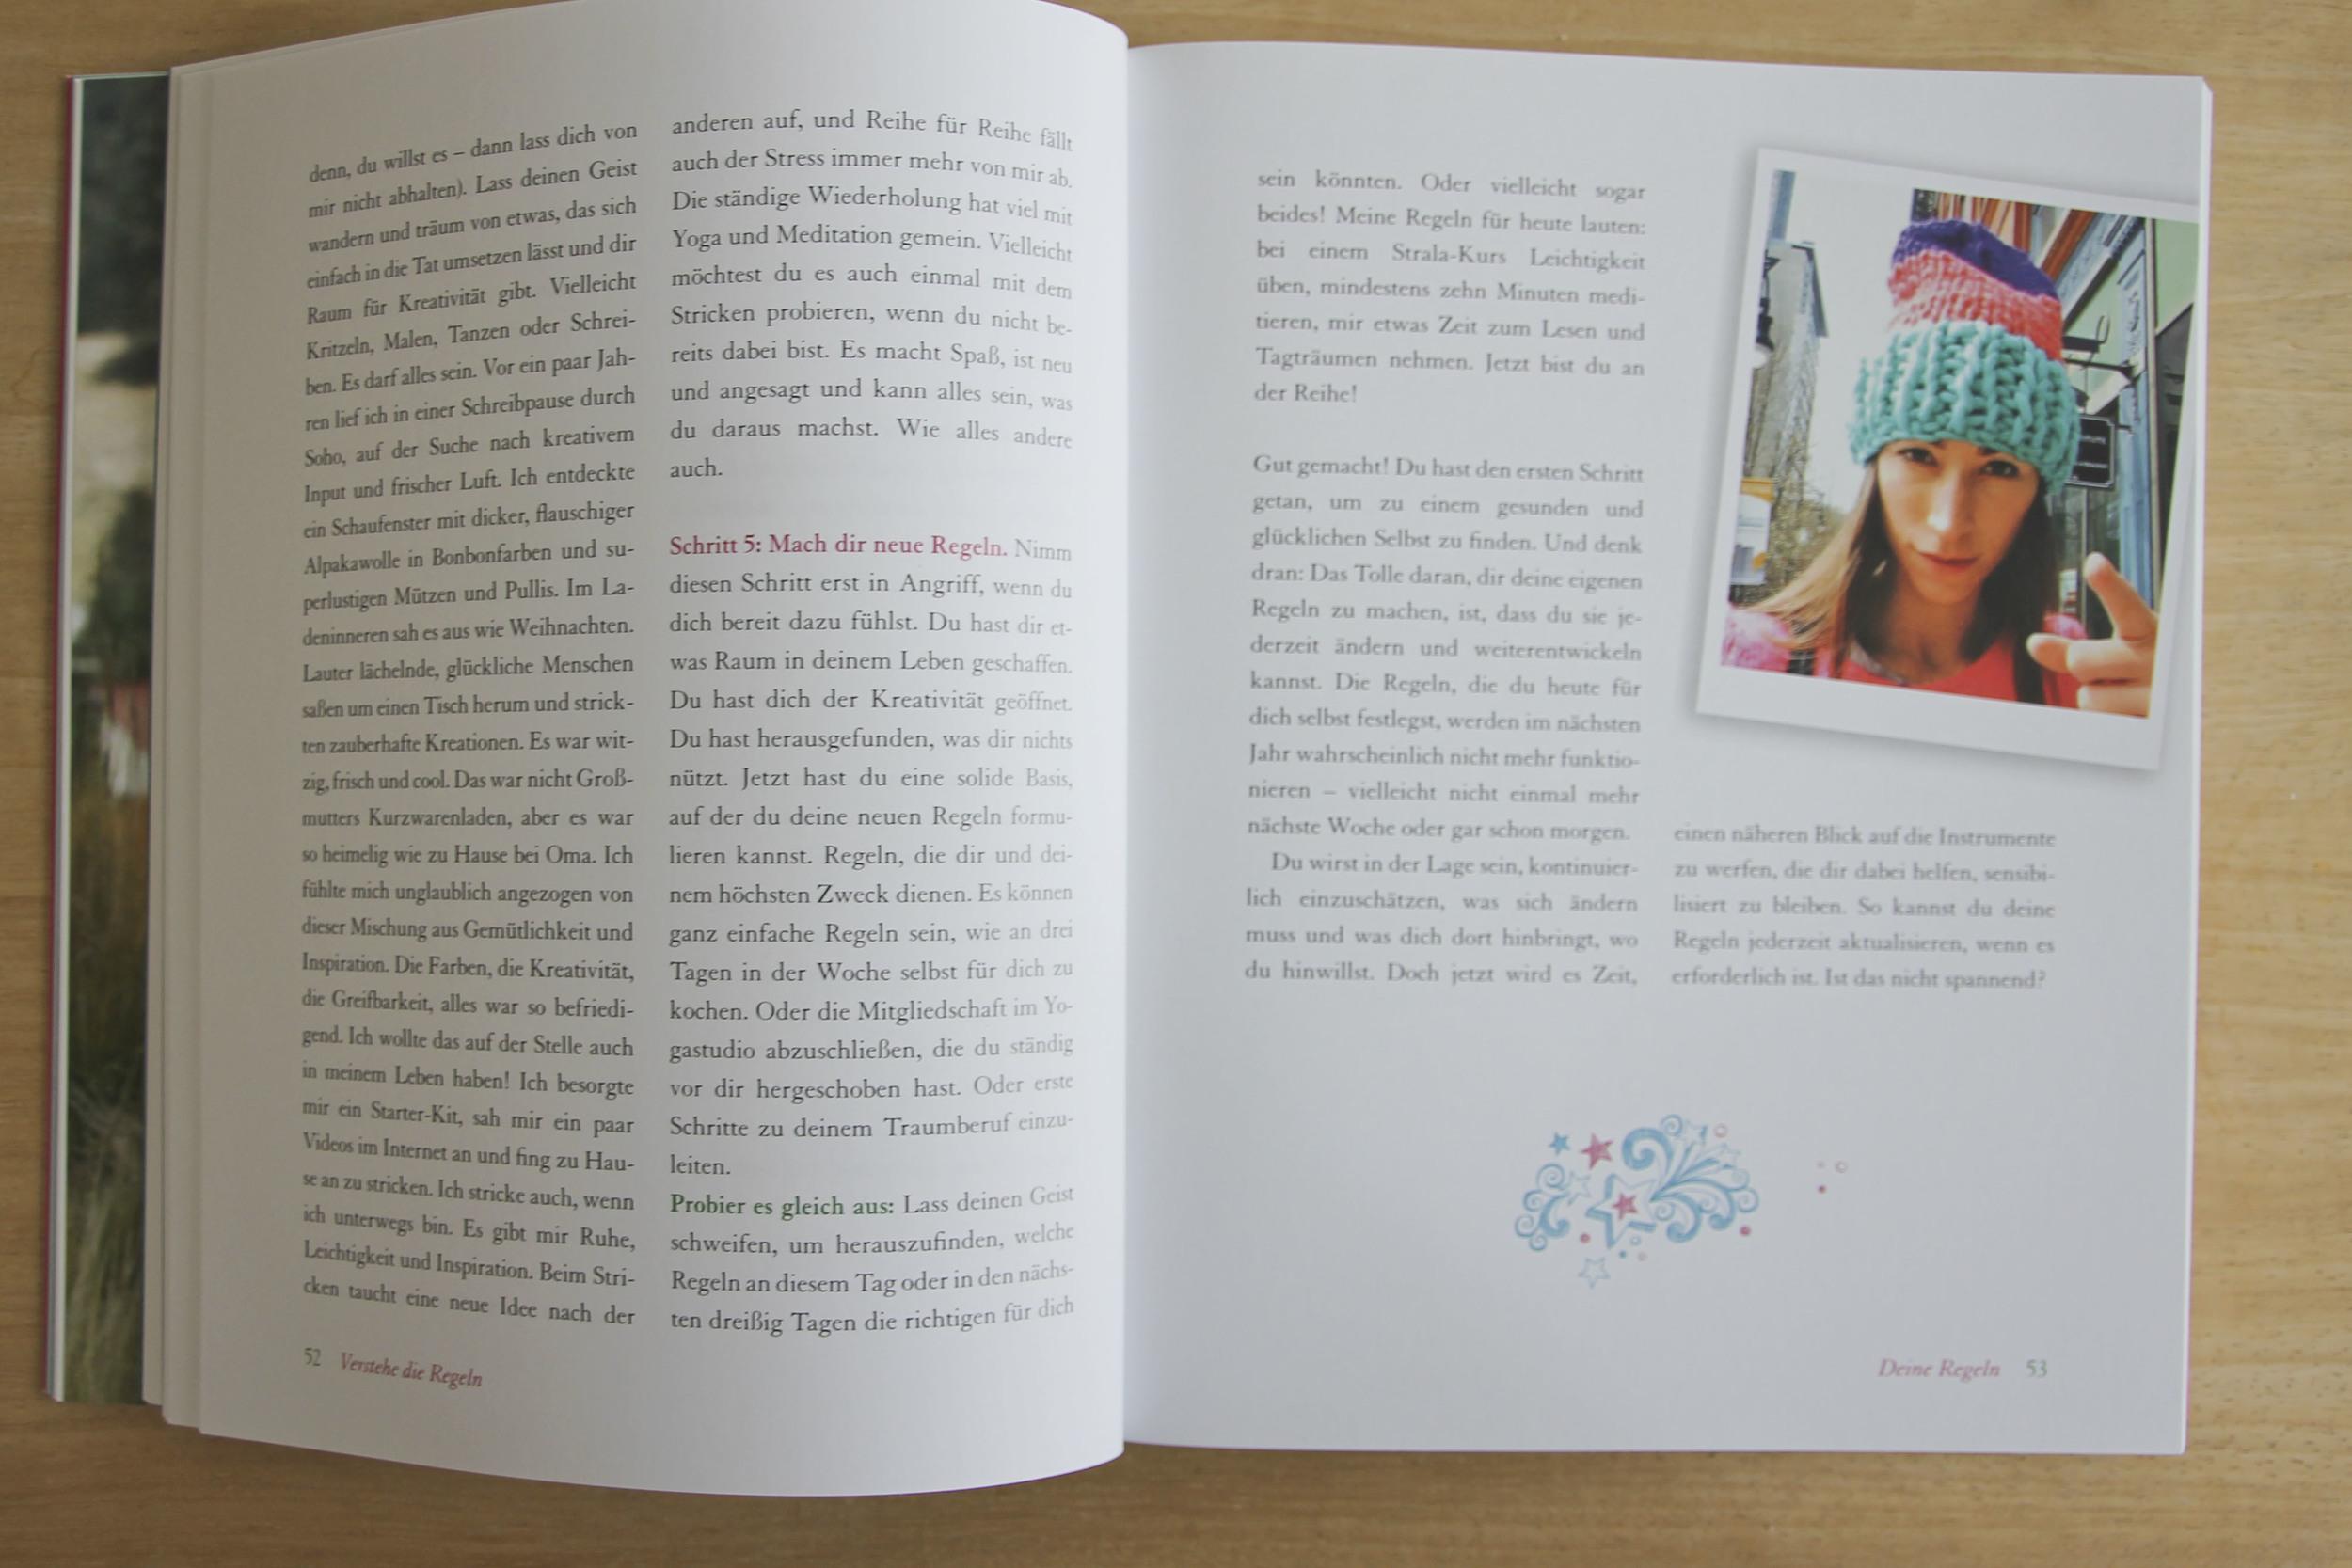 Tara Stiles, dein Yoga dein Leben, Rezeptbuch, Yoga Buch, Ratgeber3234.jpg